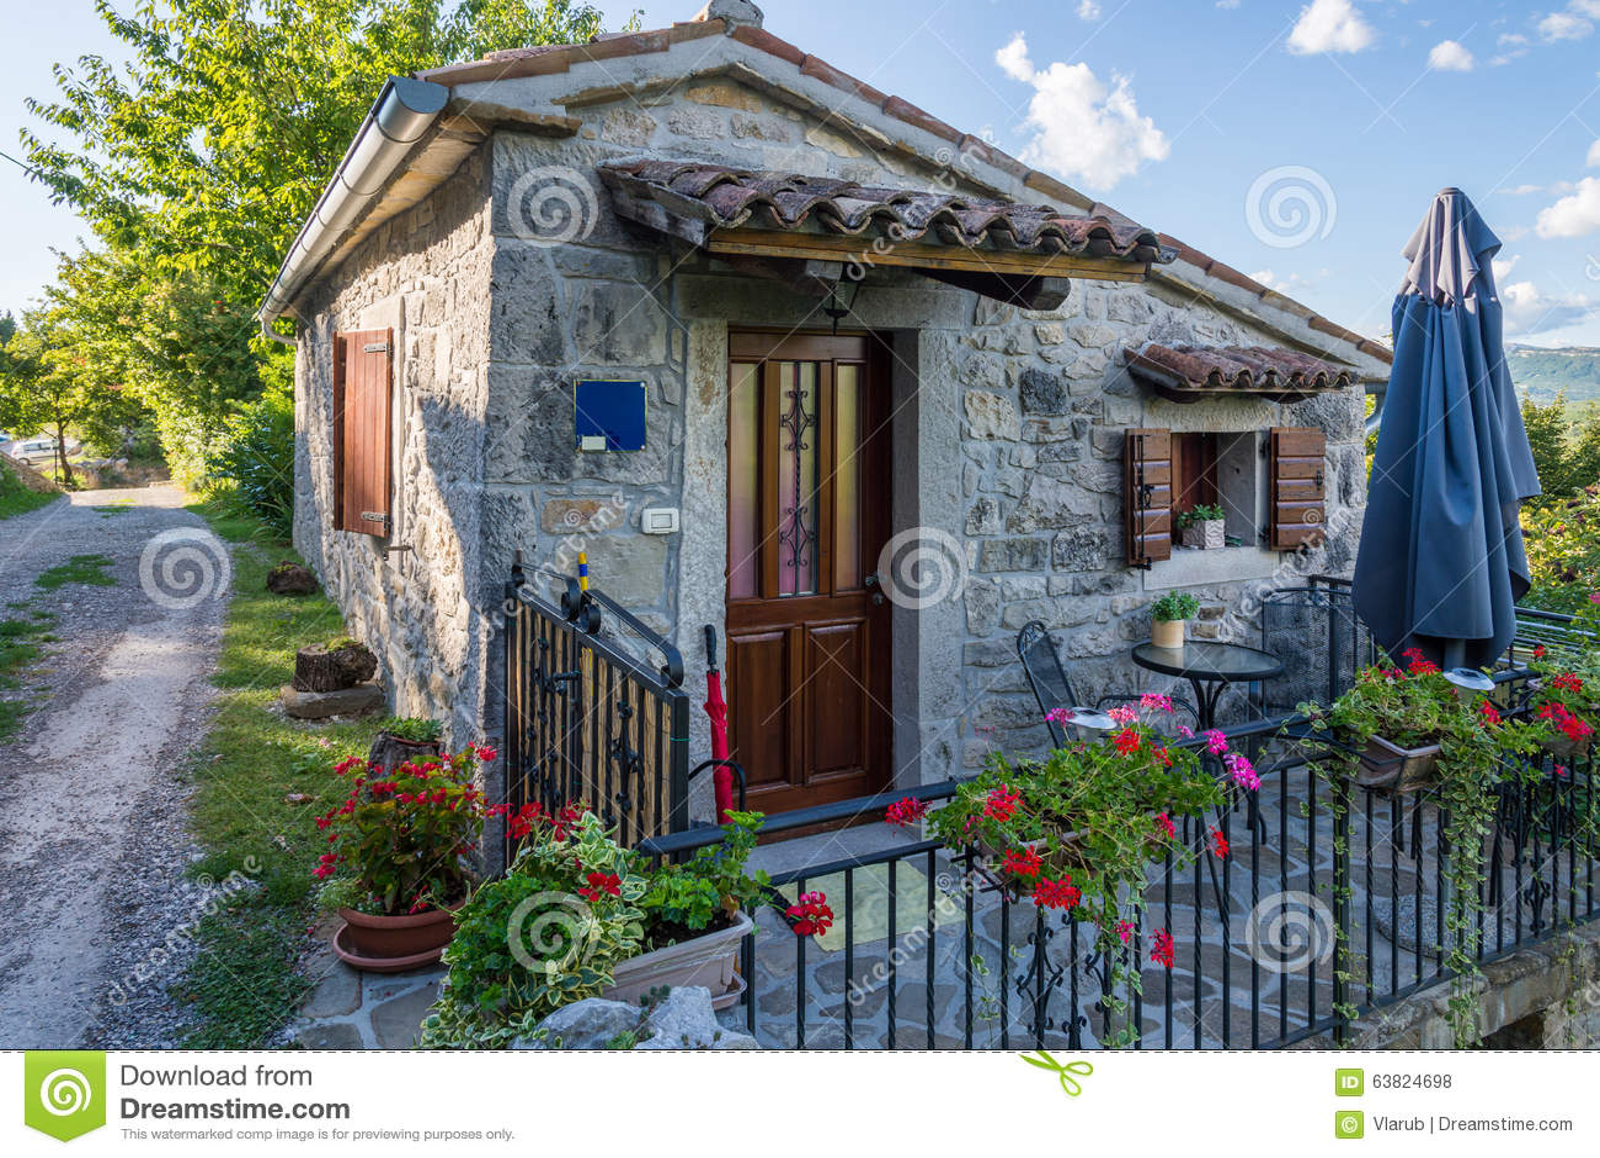 piccola casa di pietra con un recinto del metallo